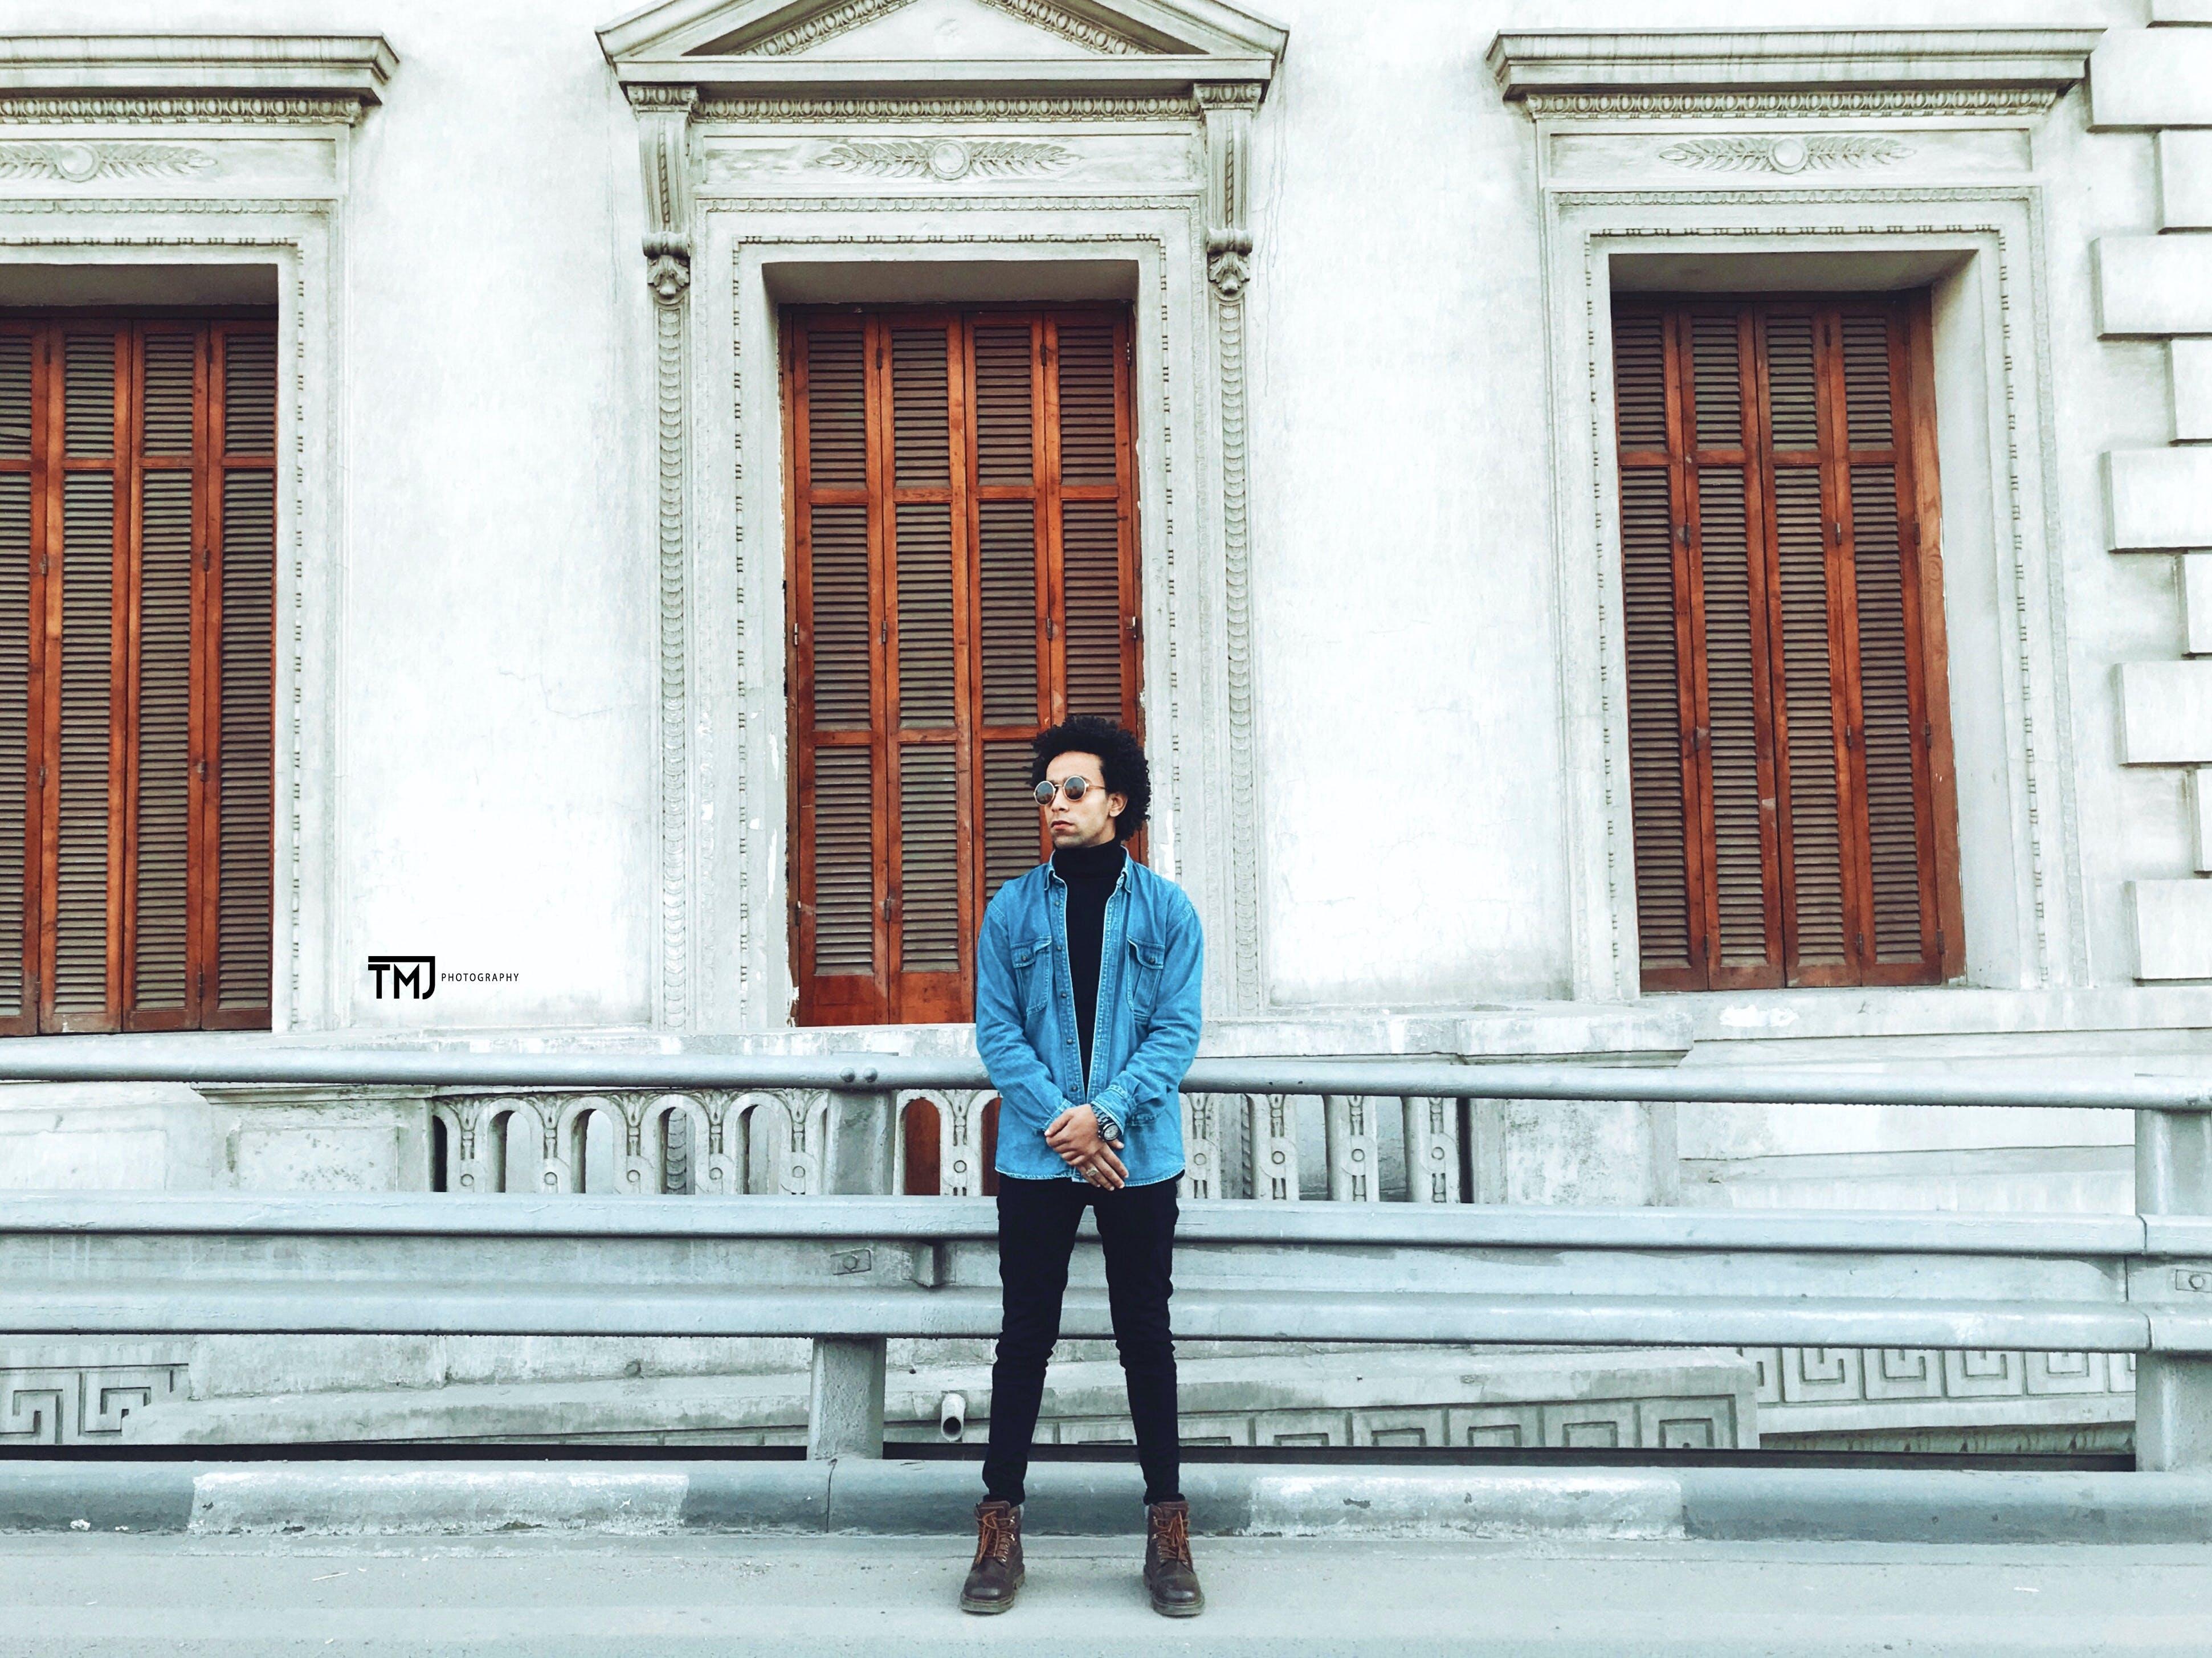 Man Wearing Blue Jacket